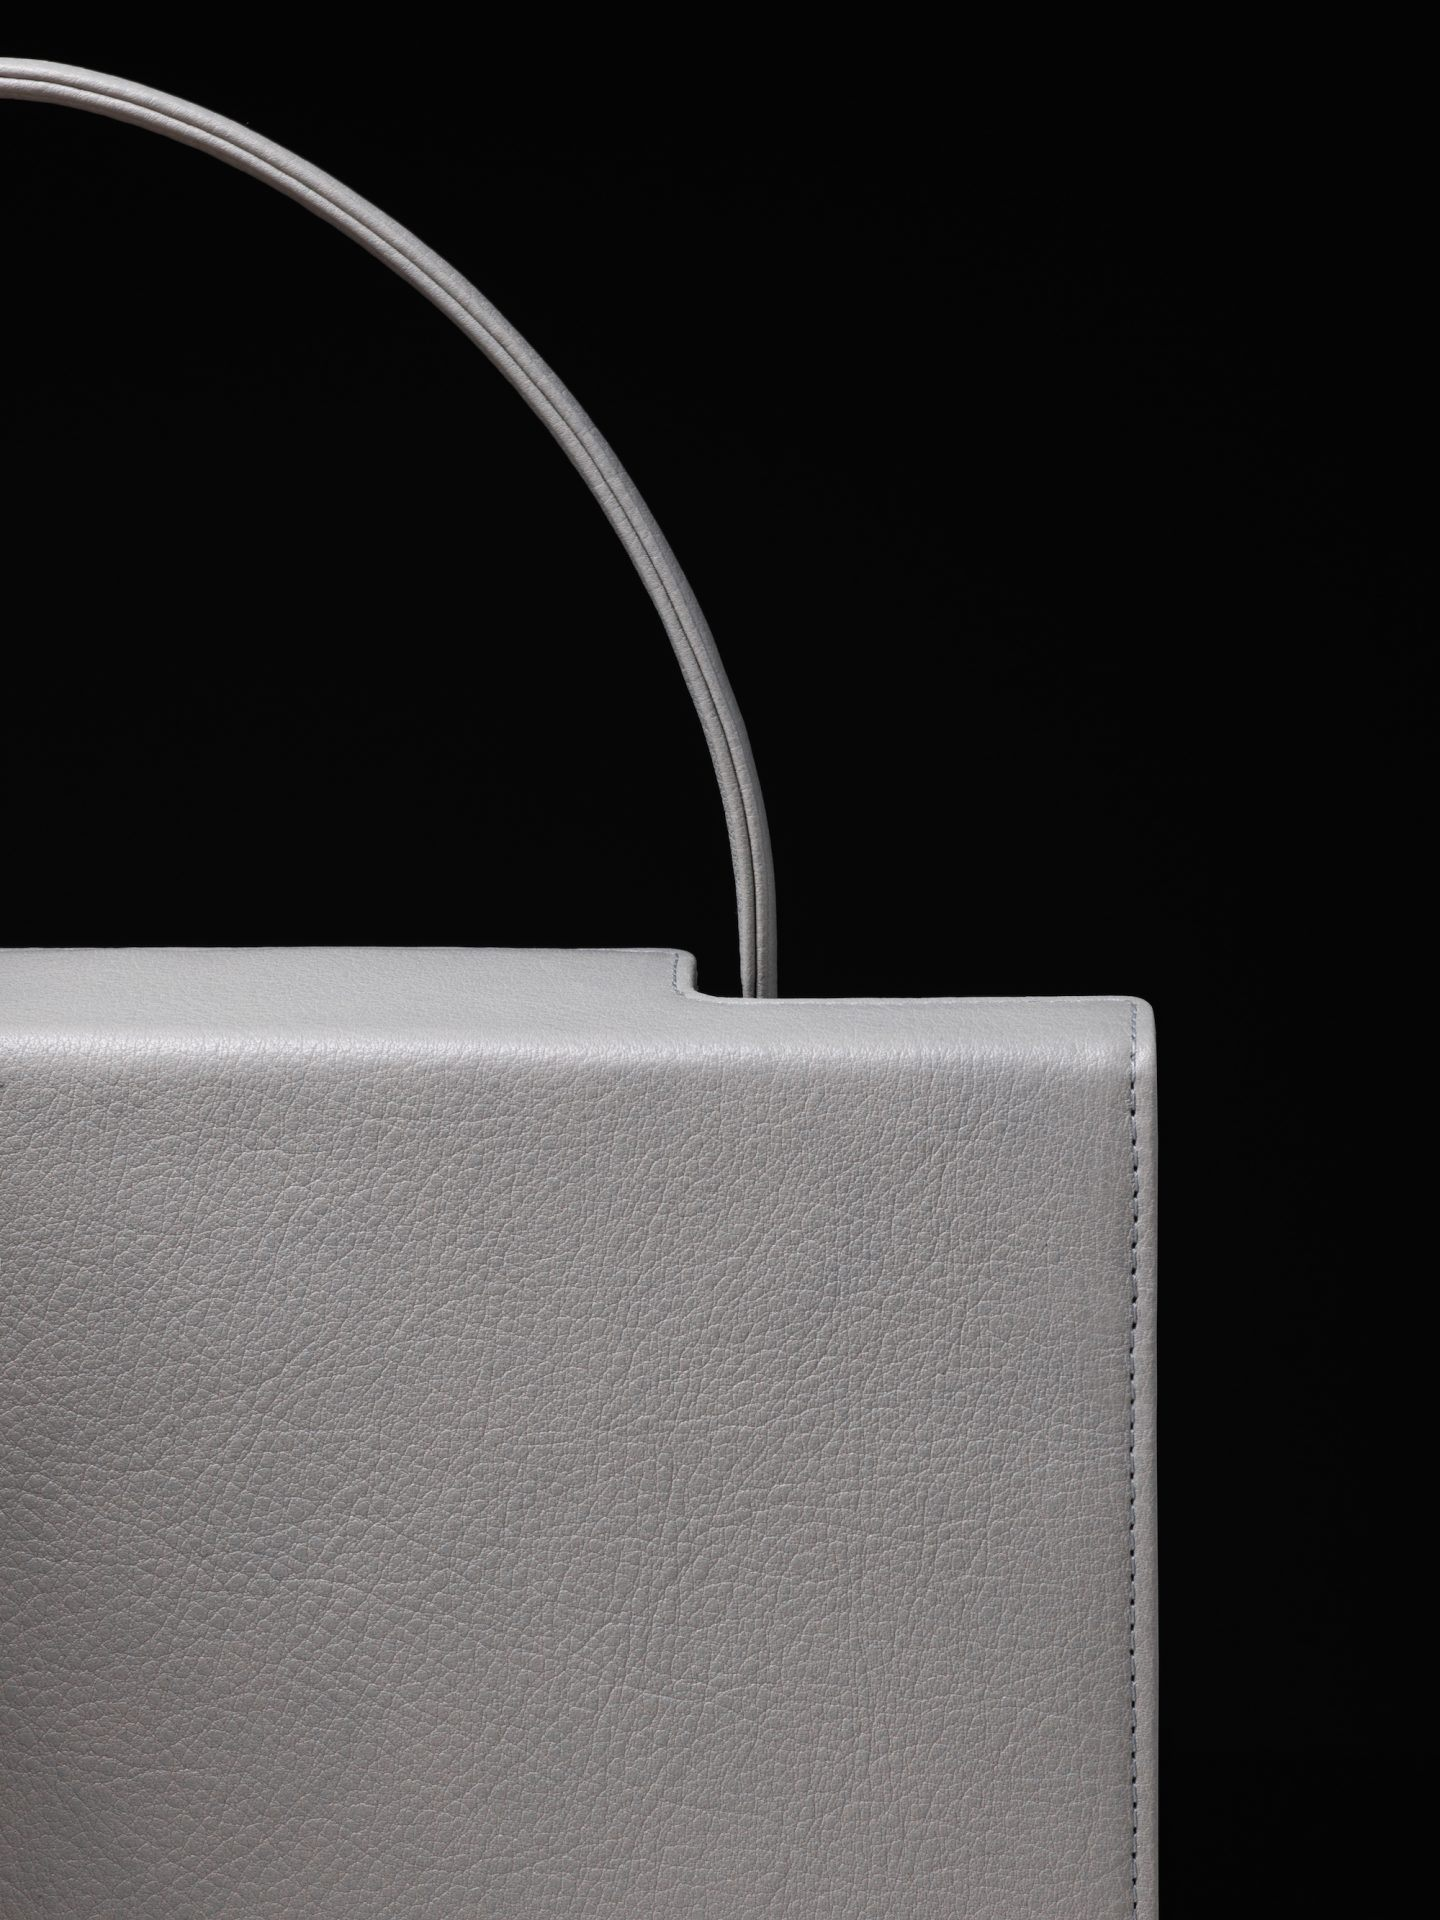 IGNANT-Design-Tsatsas-Dieter-Rams-931-011